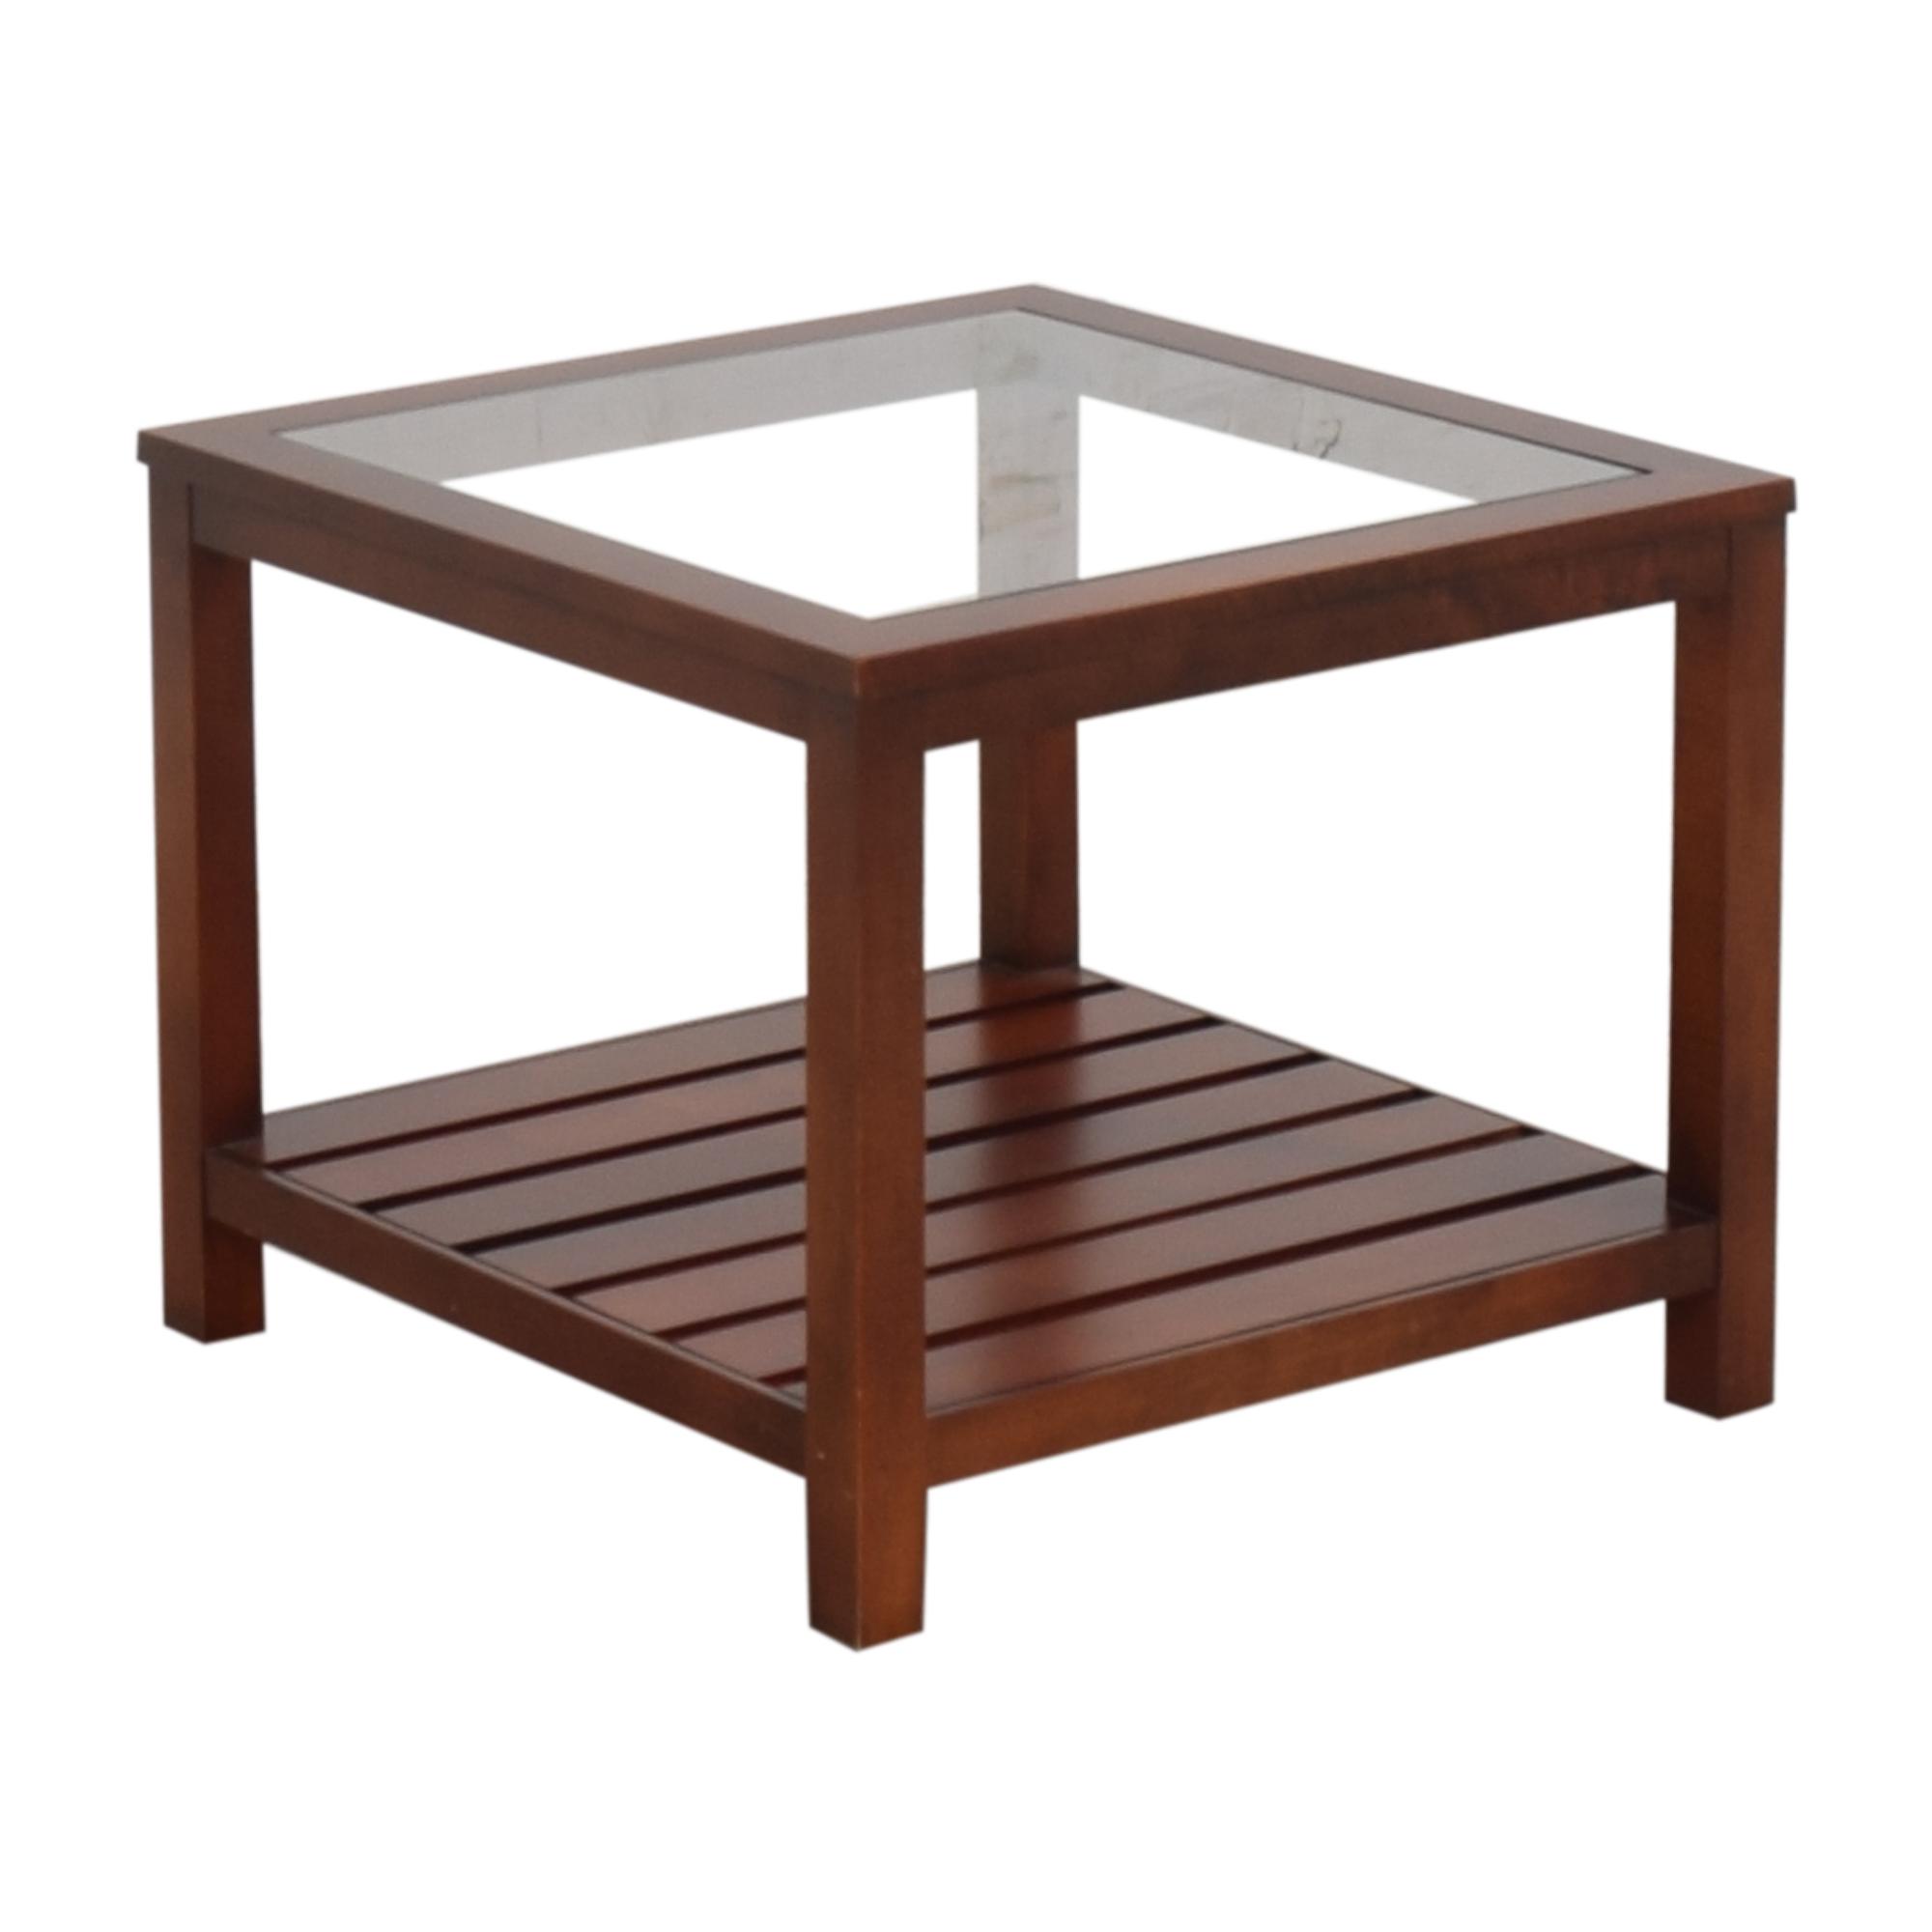 Ethan Allen Ethan Allen Custom Classics Side Table price